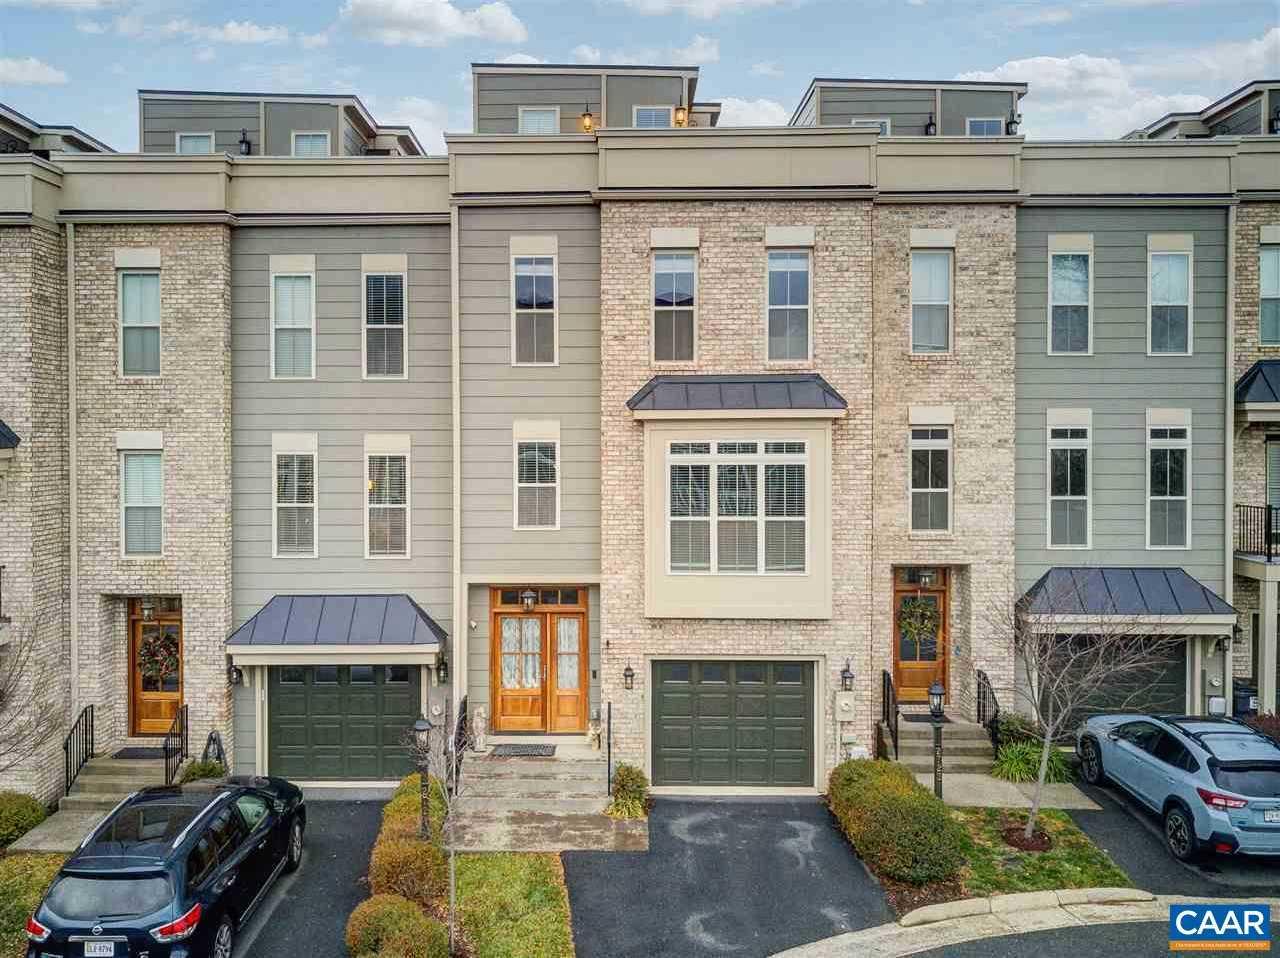 $449,900 - 3Br/4Ba -  for Sale in Avinity, Charlottesville